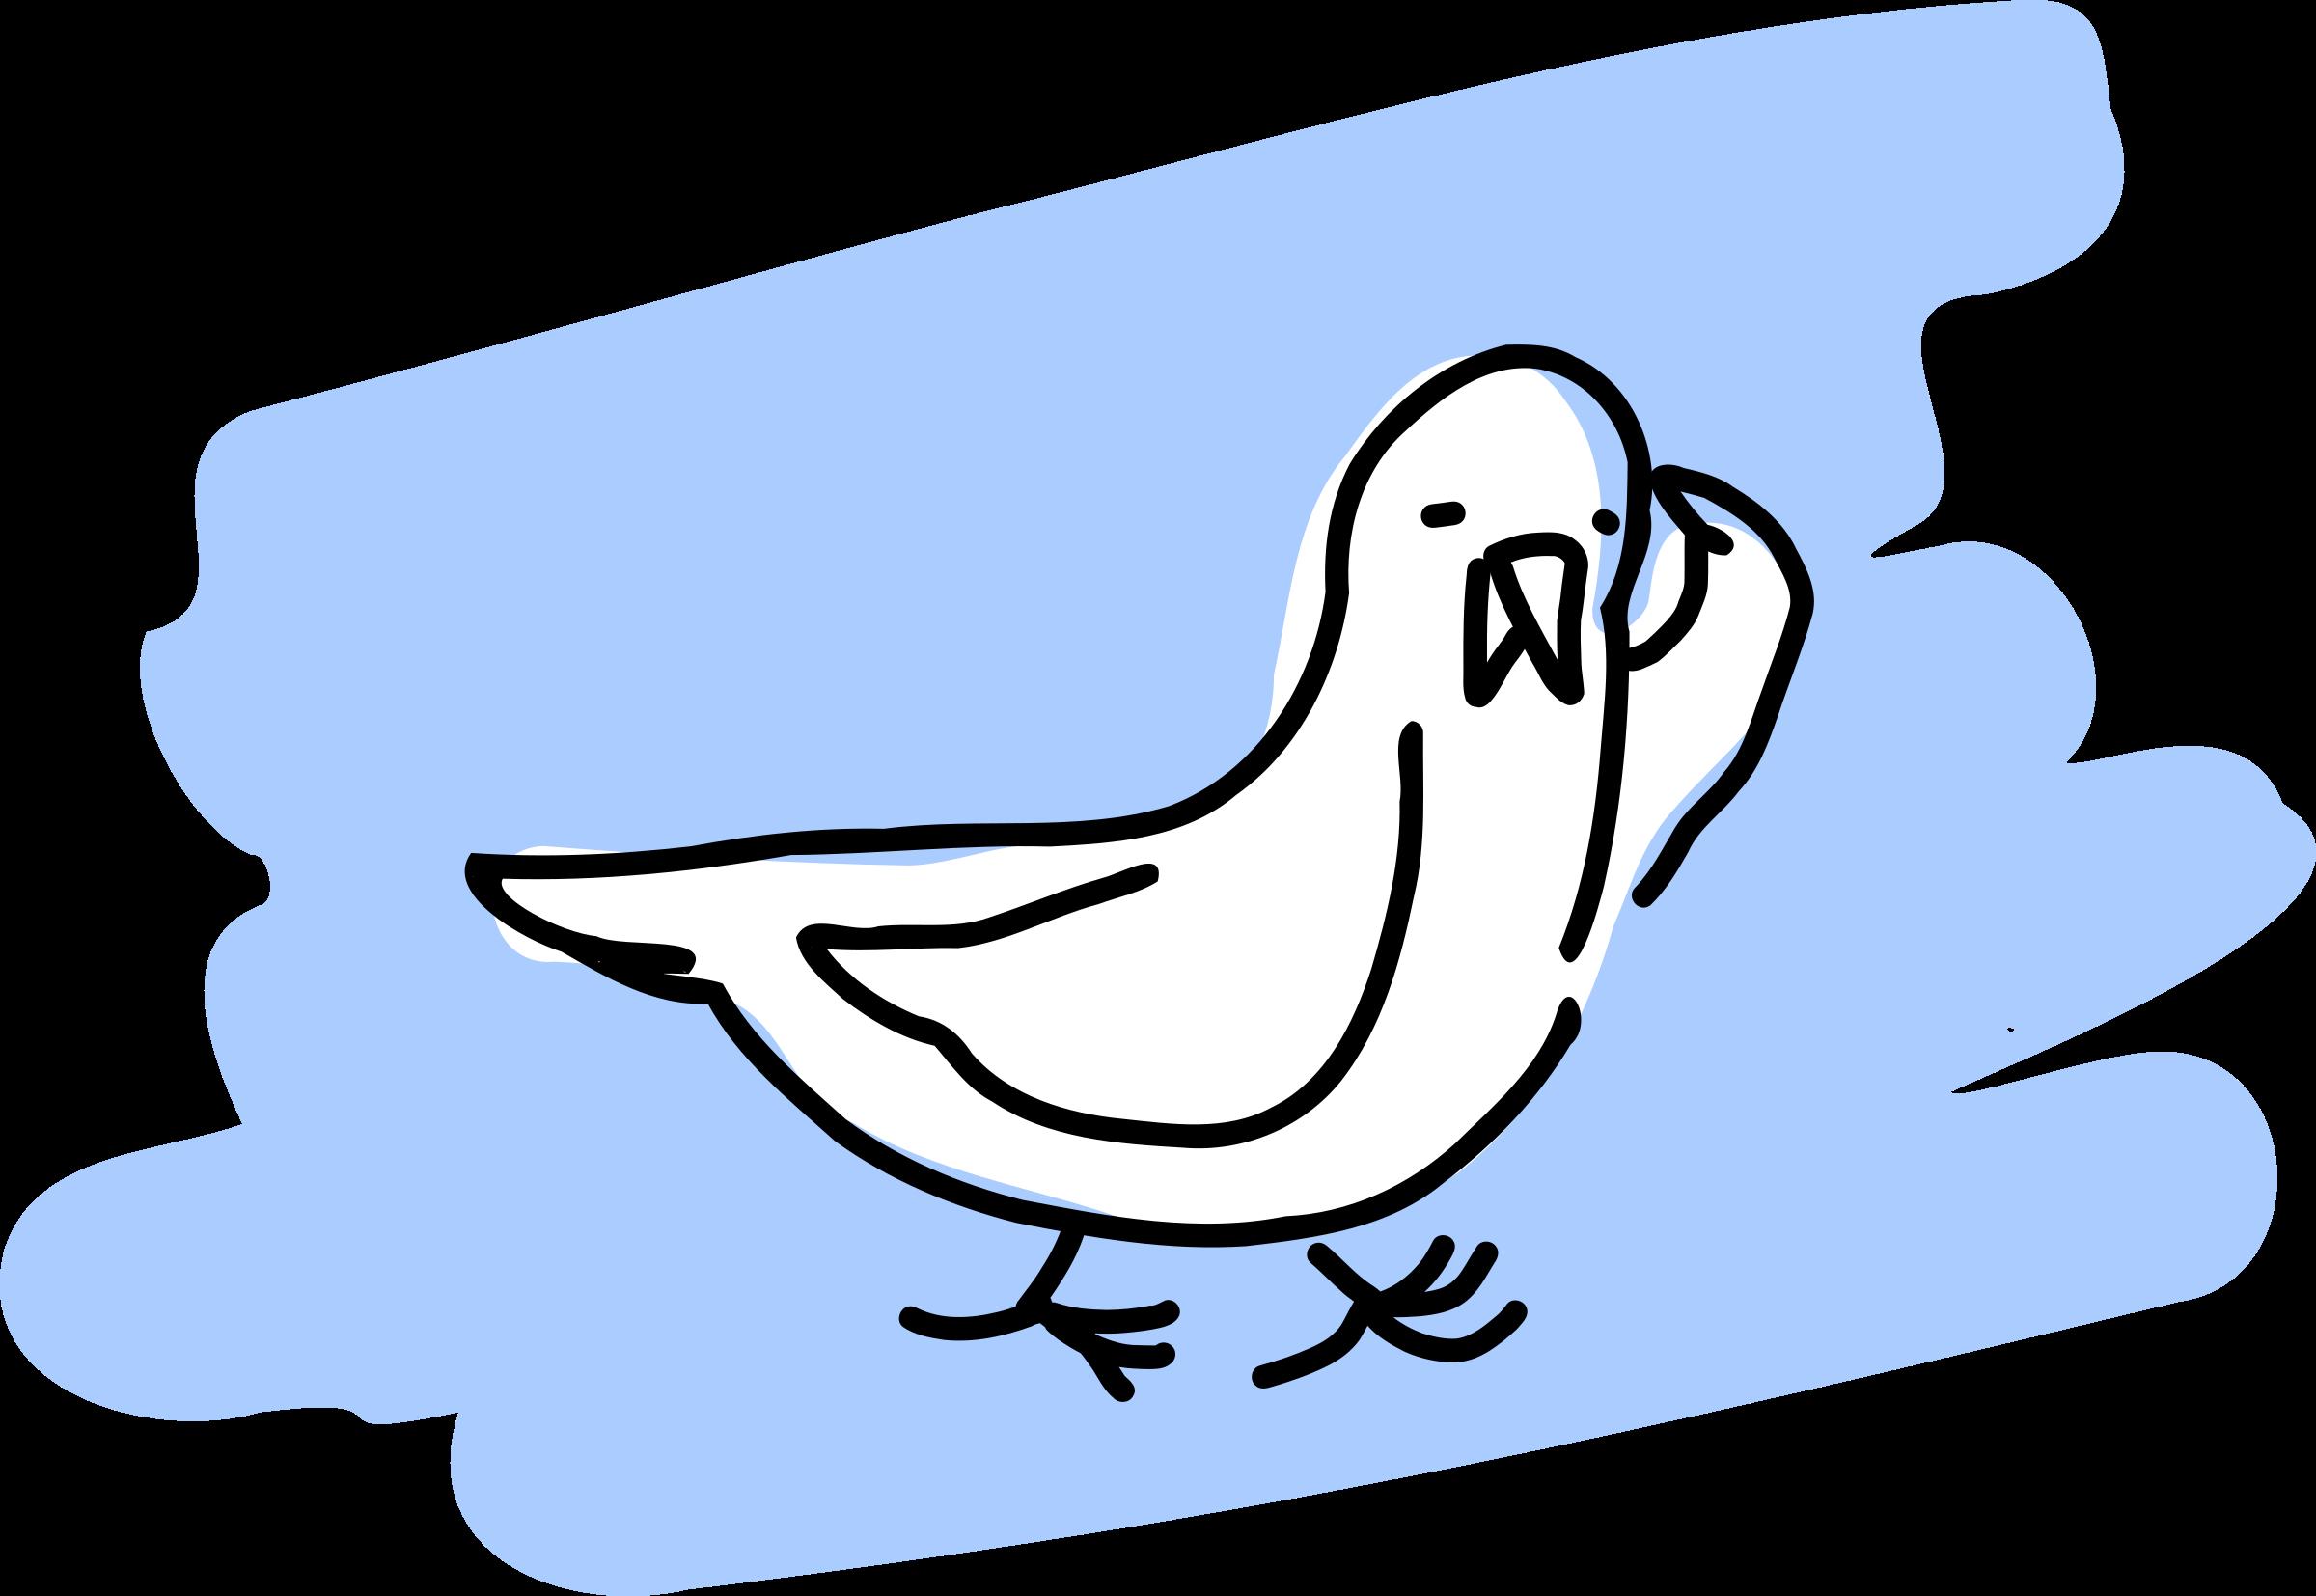 Clipart seagull 2